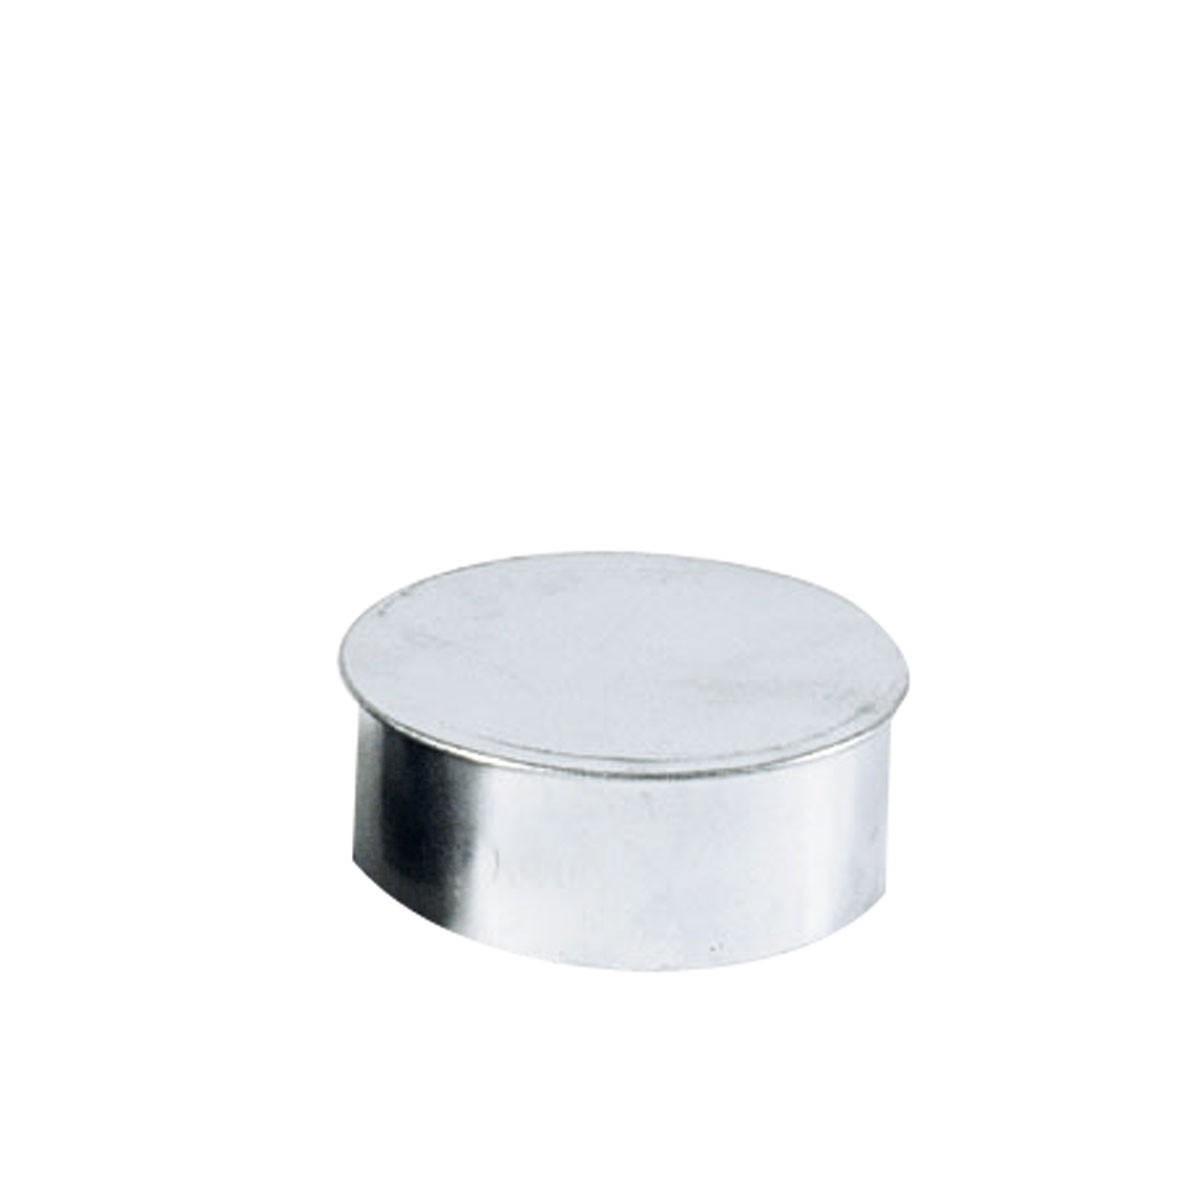 Kaminlochkapsel / Rohrkapsel KaminoFlam FAL Ø 150 mm Bild 1